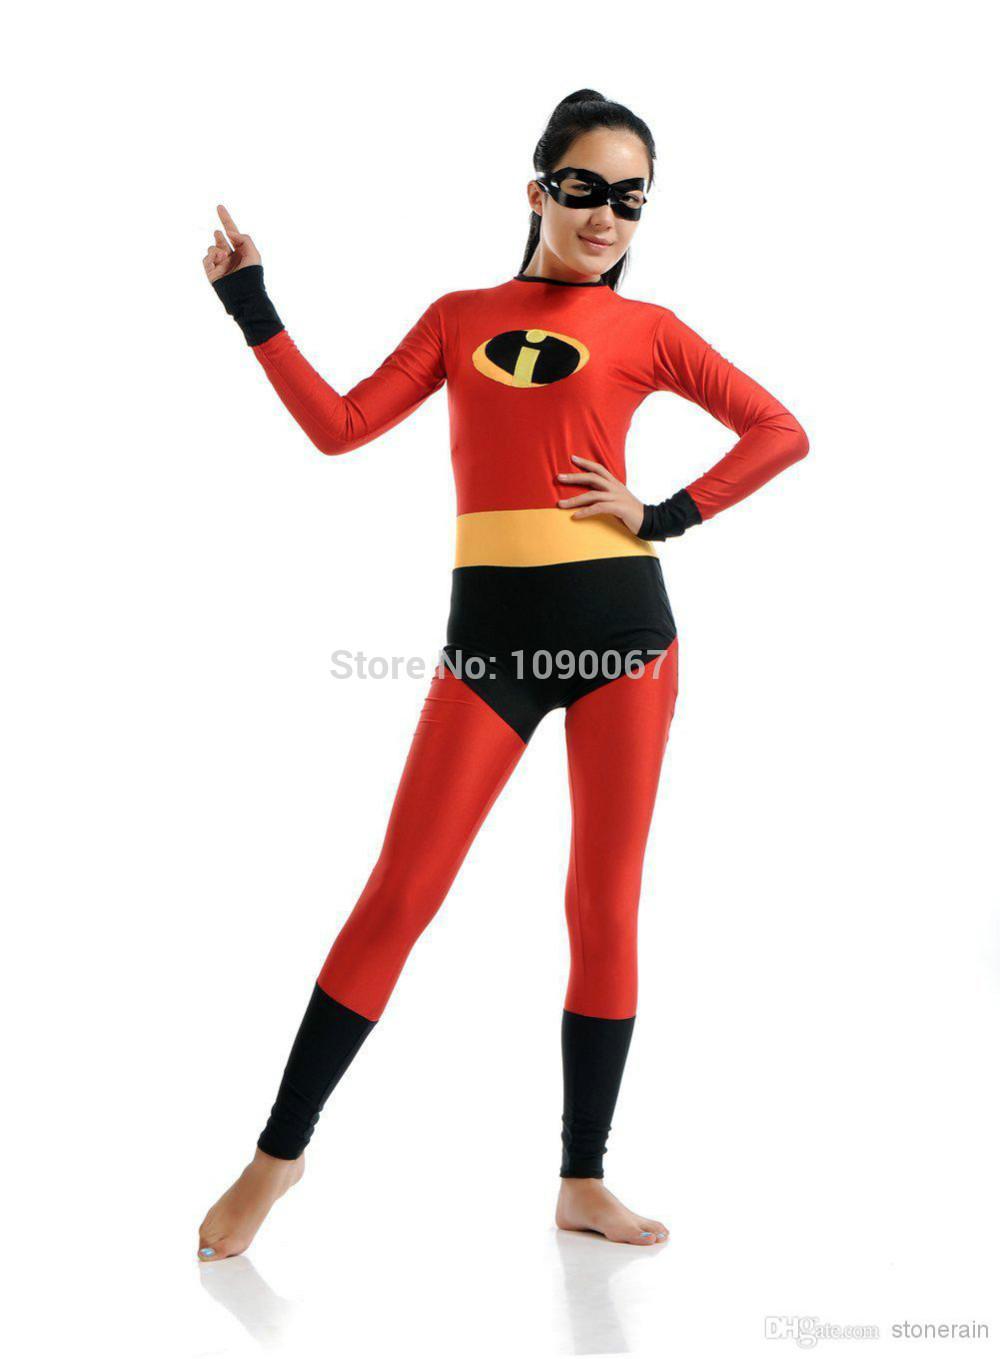 Incredibles Dash Costume Incredibles Costume